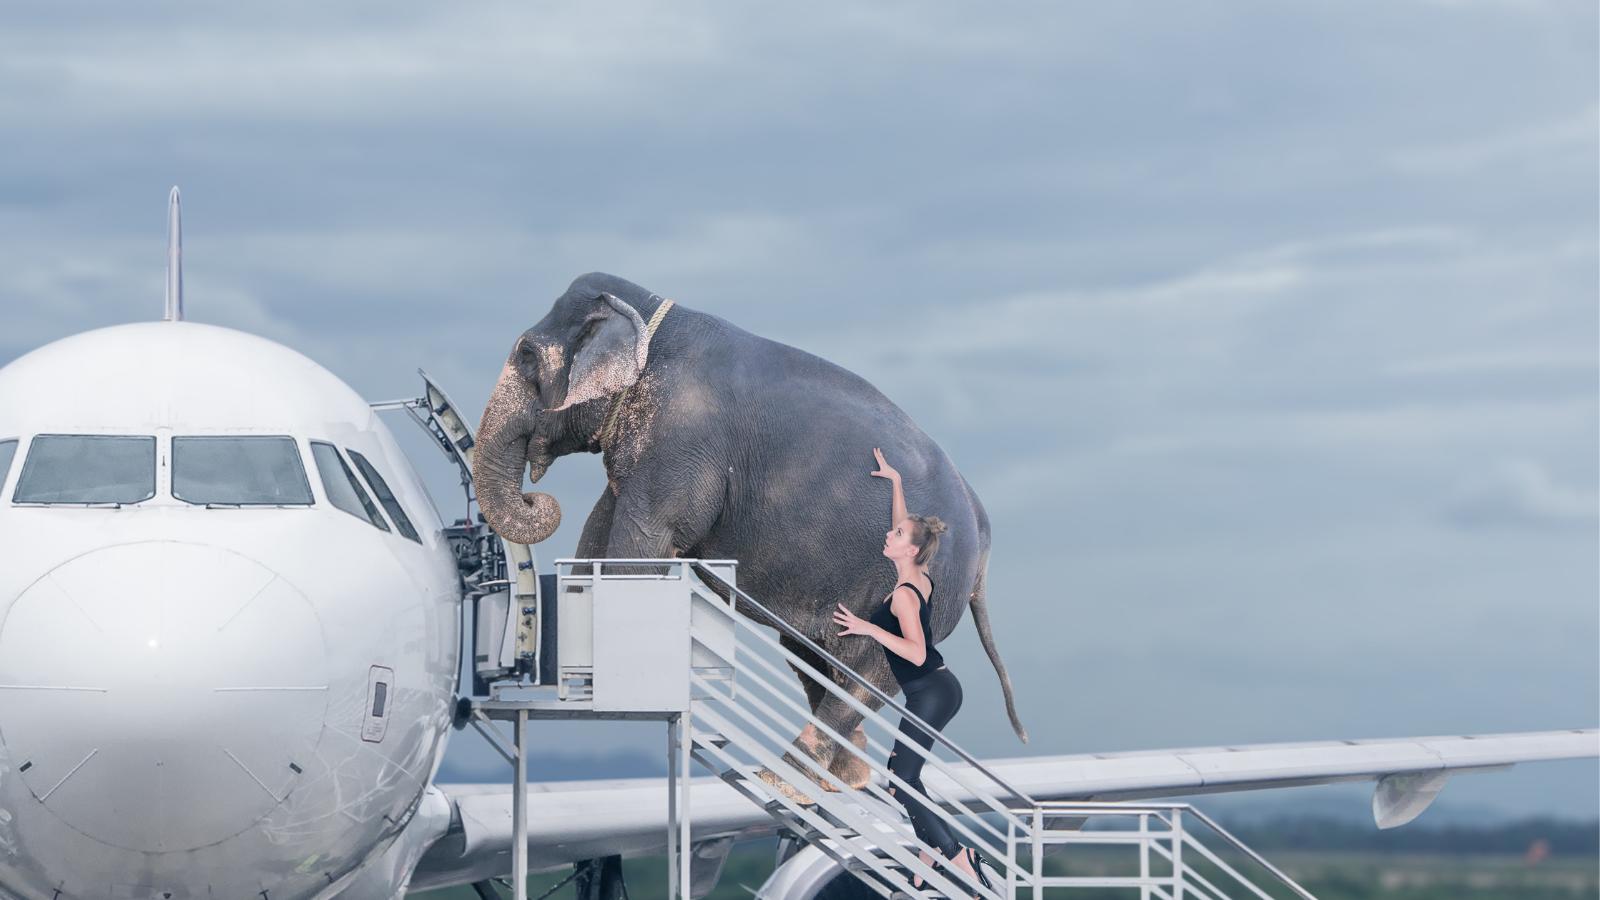 Loading elephant onto airplane